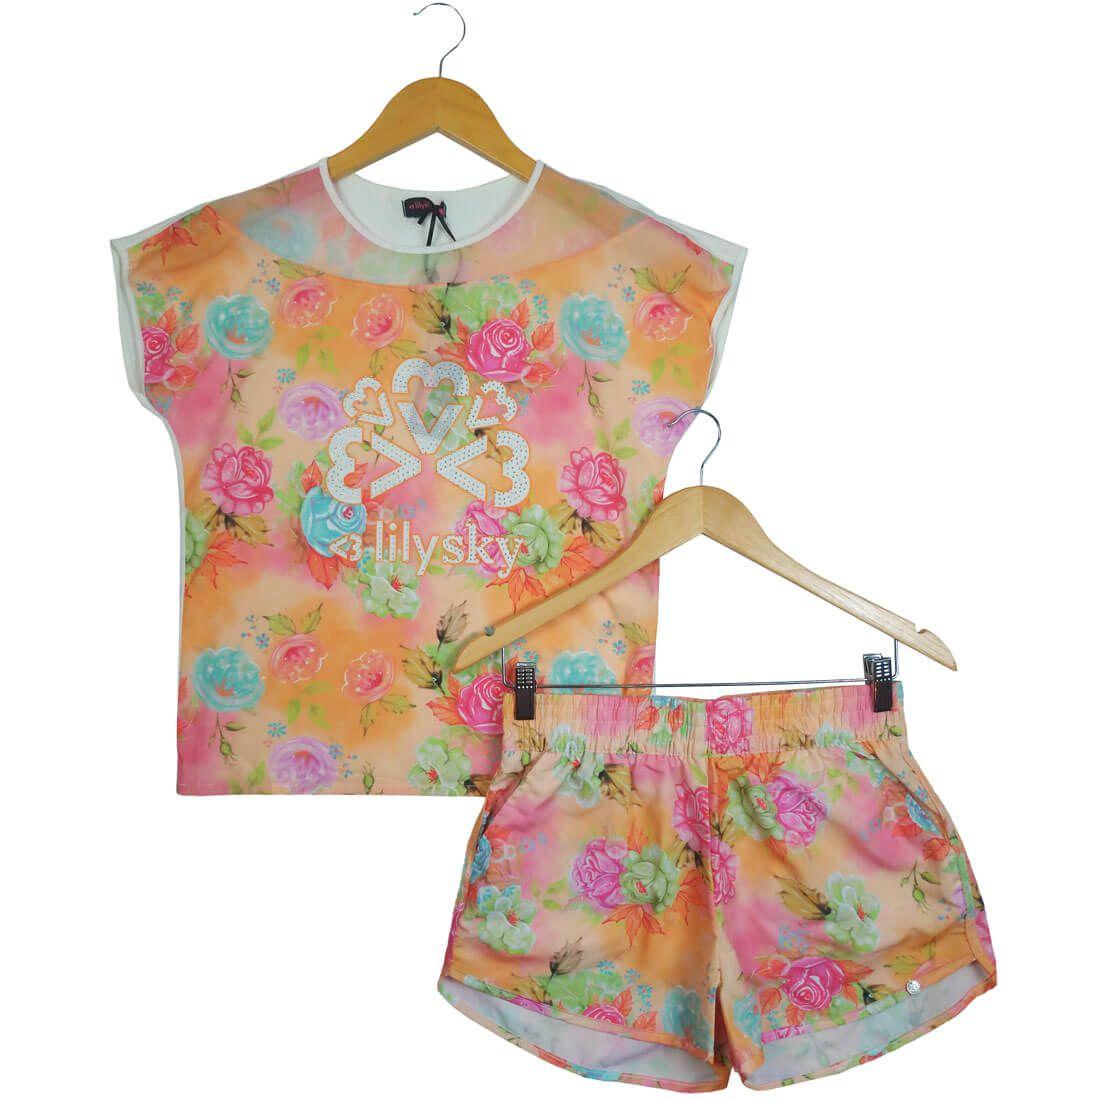 1cbbf49b5 Conjunto Turma da Malha Lilysky Flores - Morebaby Loja Infantil ...